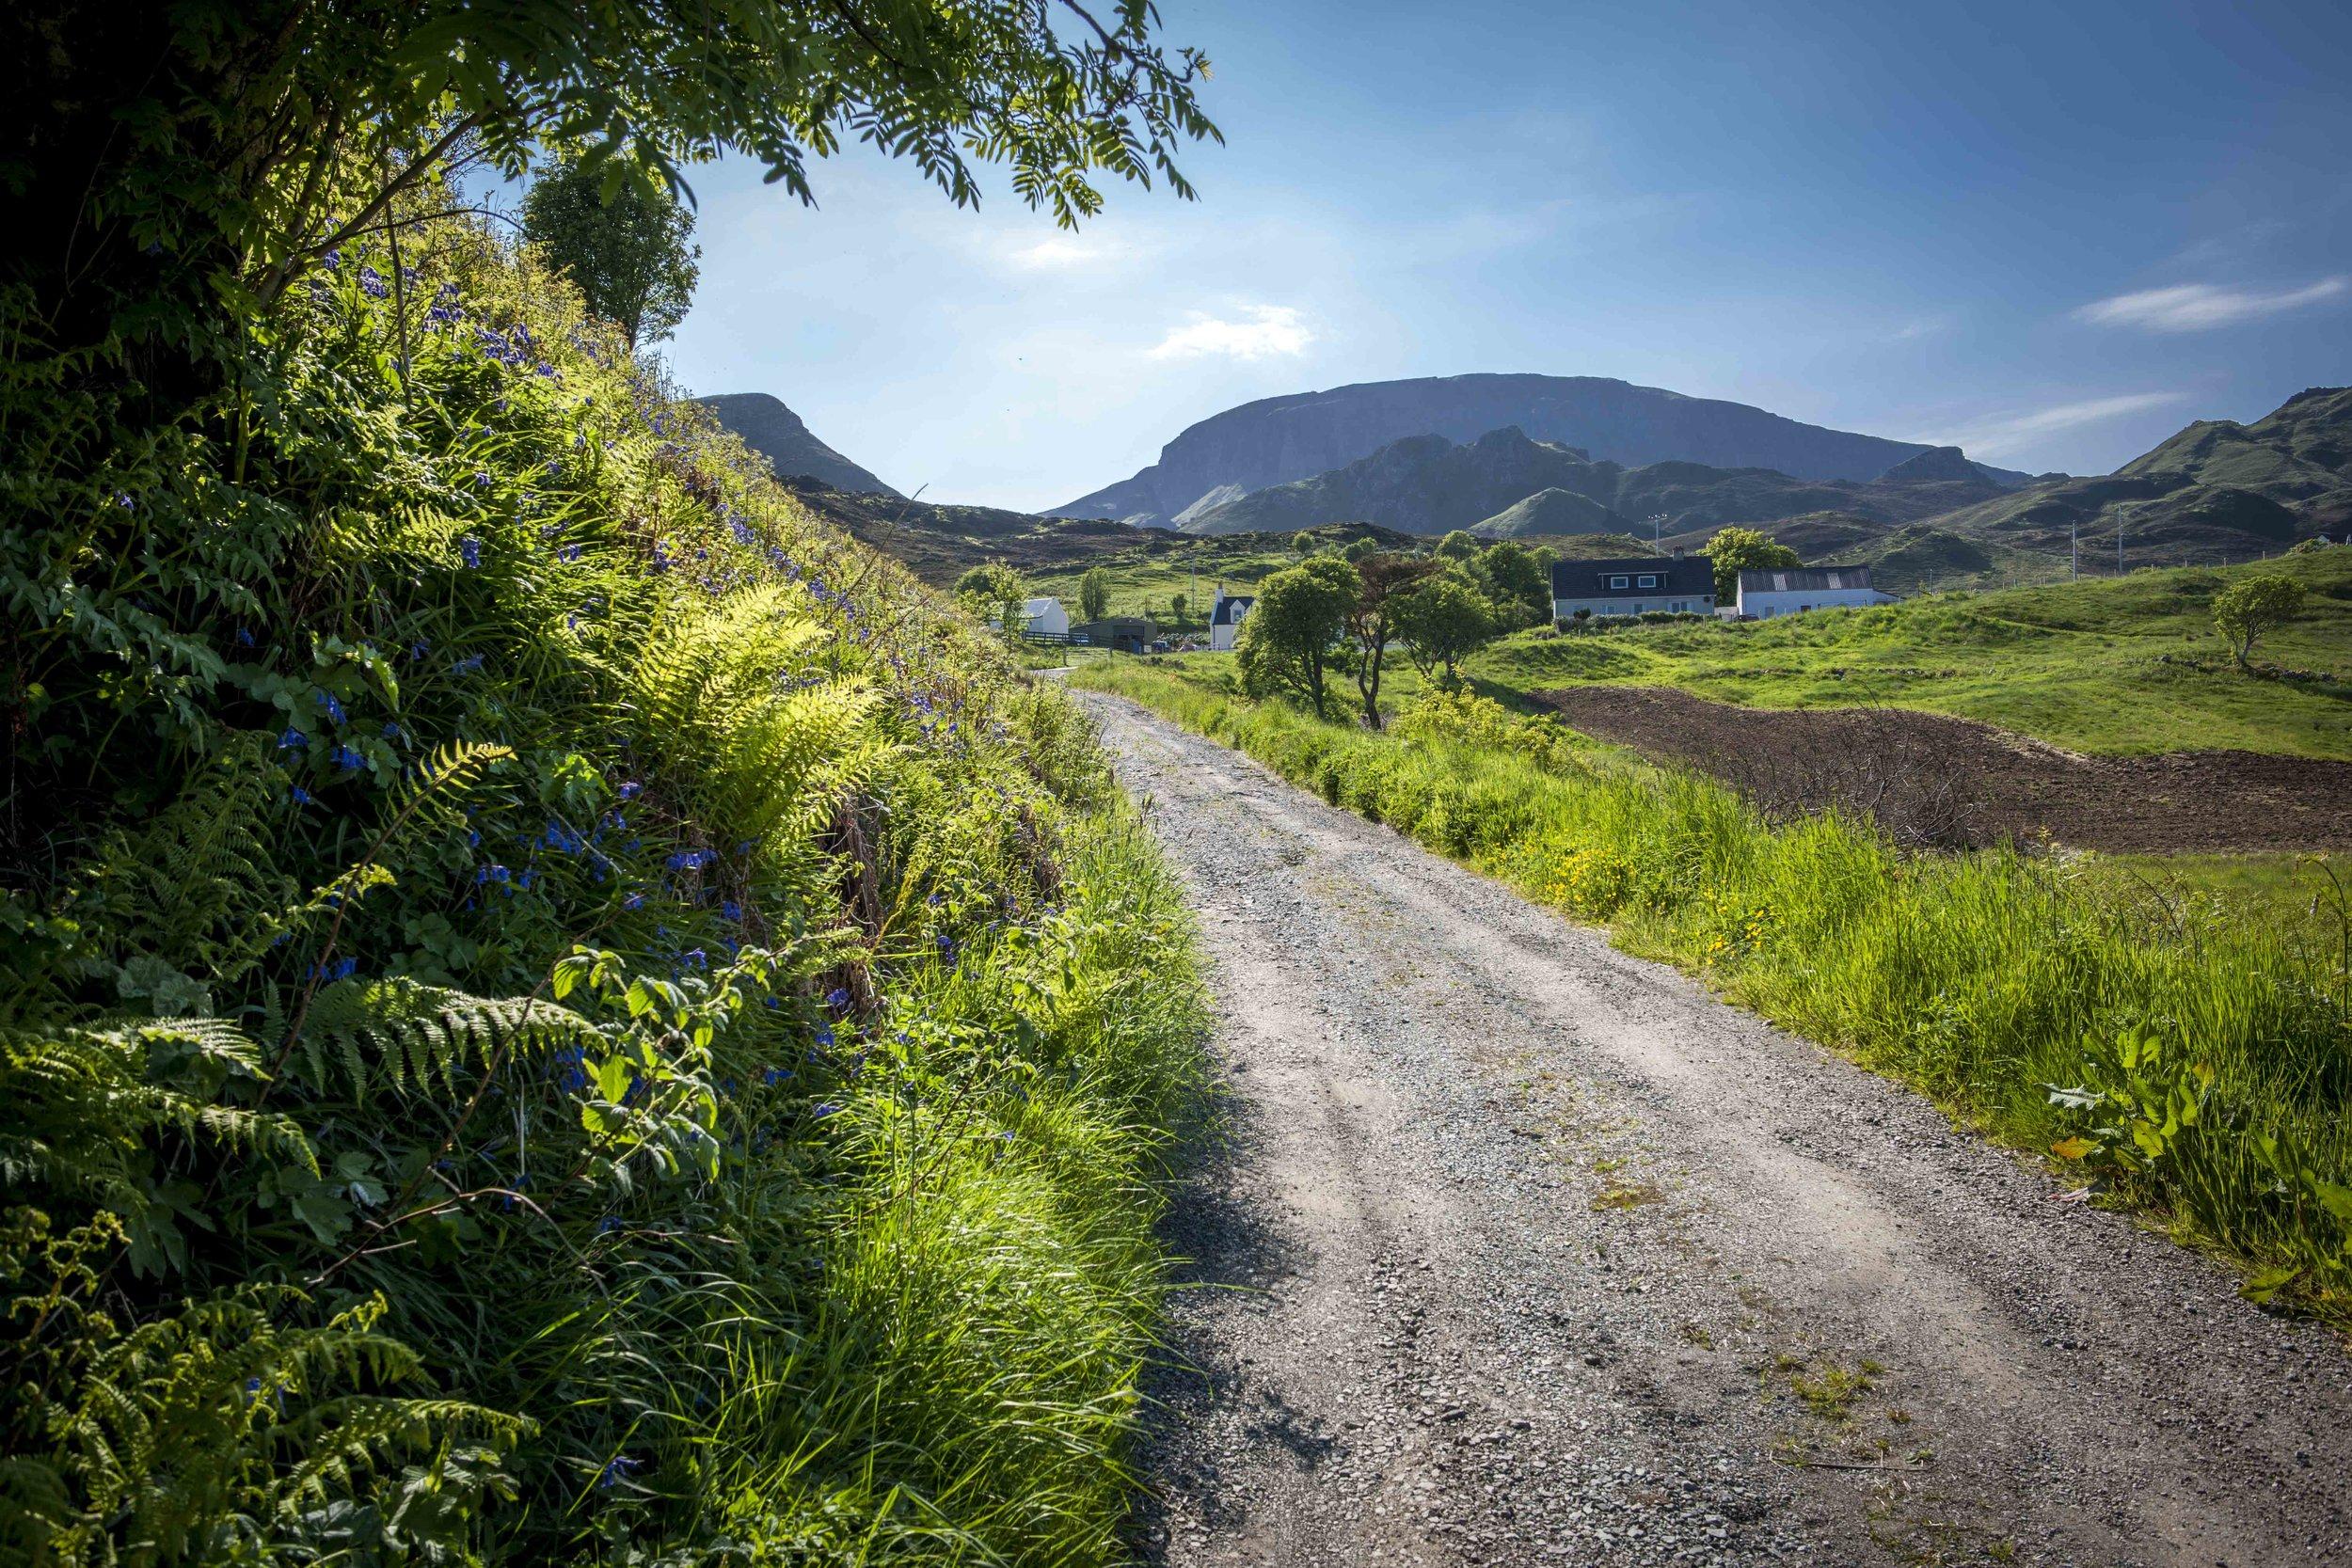 Digg, Isle of Skye -Scotland